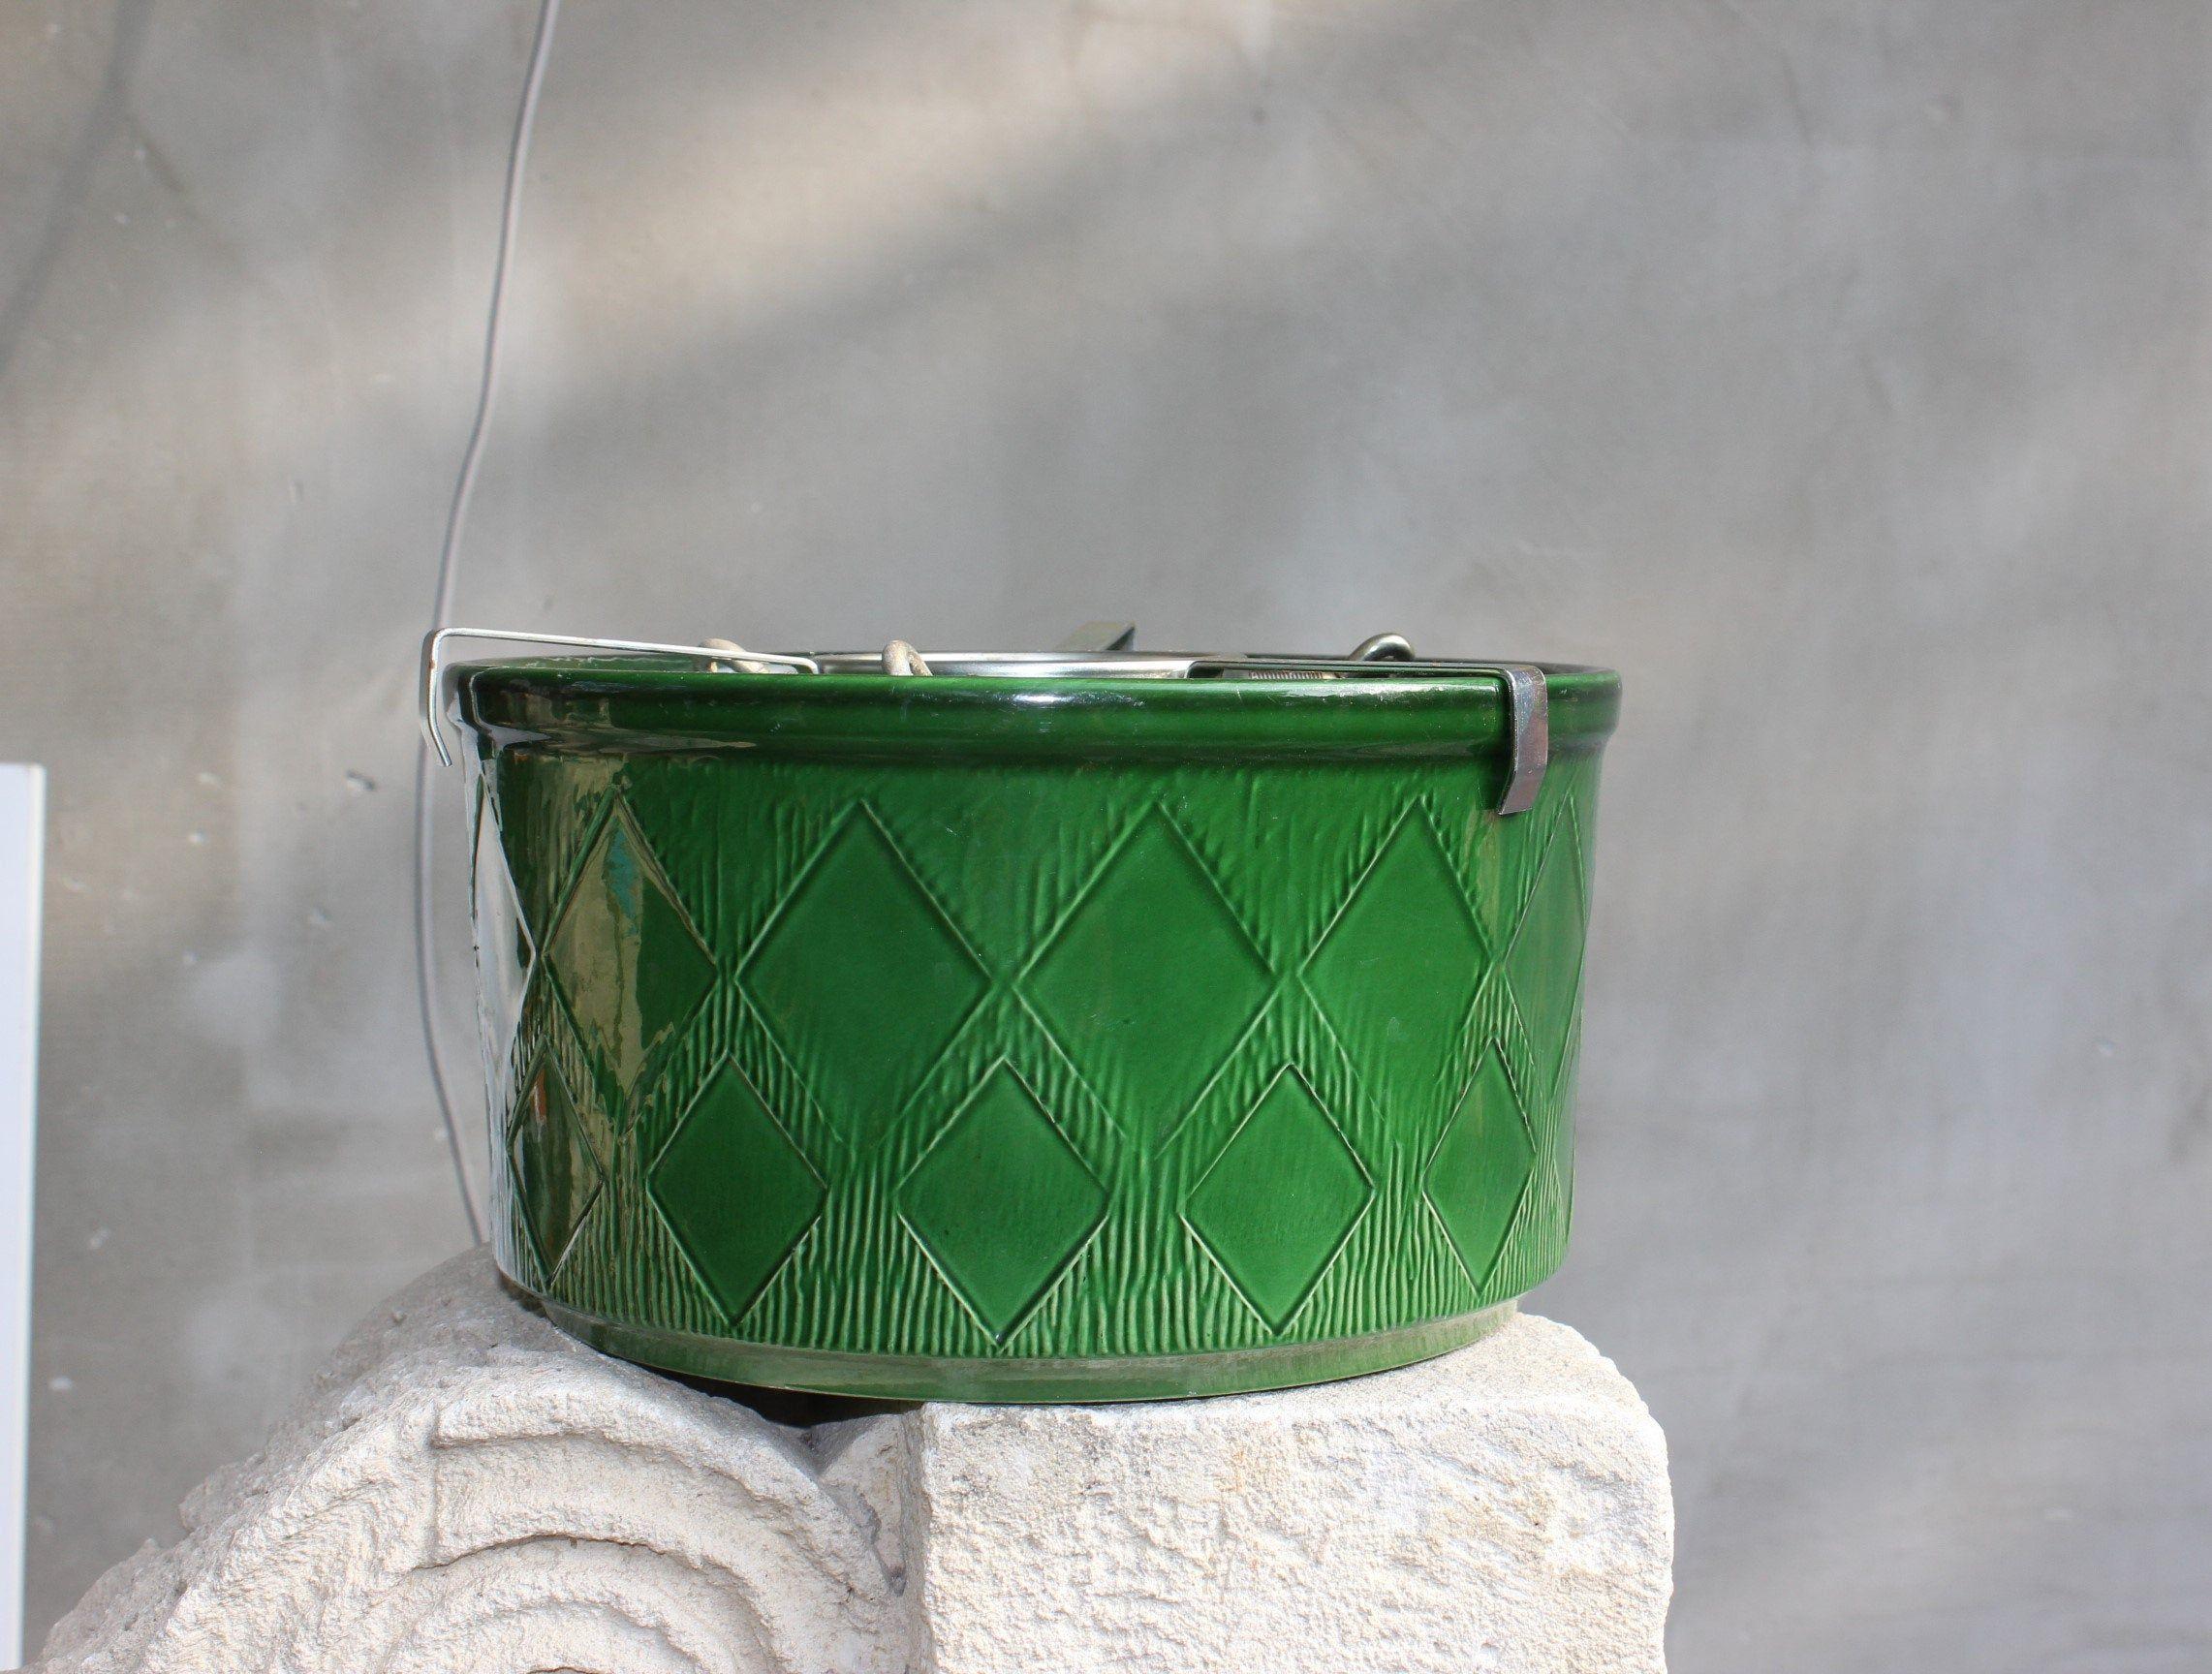 Vintage Christmas tree stand Large Green Ceramic planter  Terracotta Plant holder Garden Home Patio decor Gift